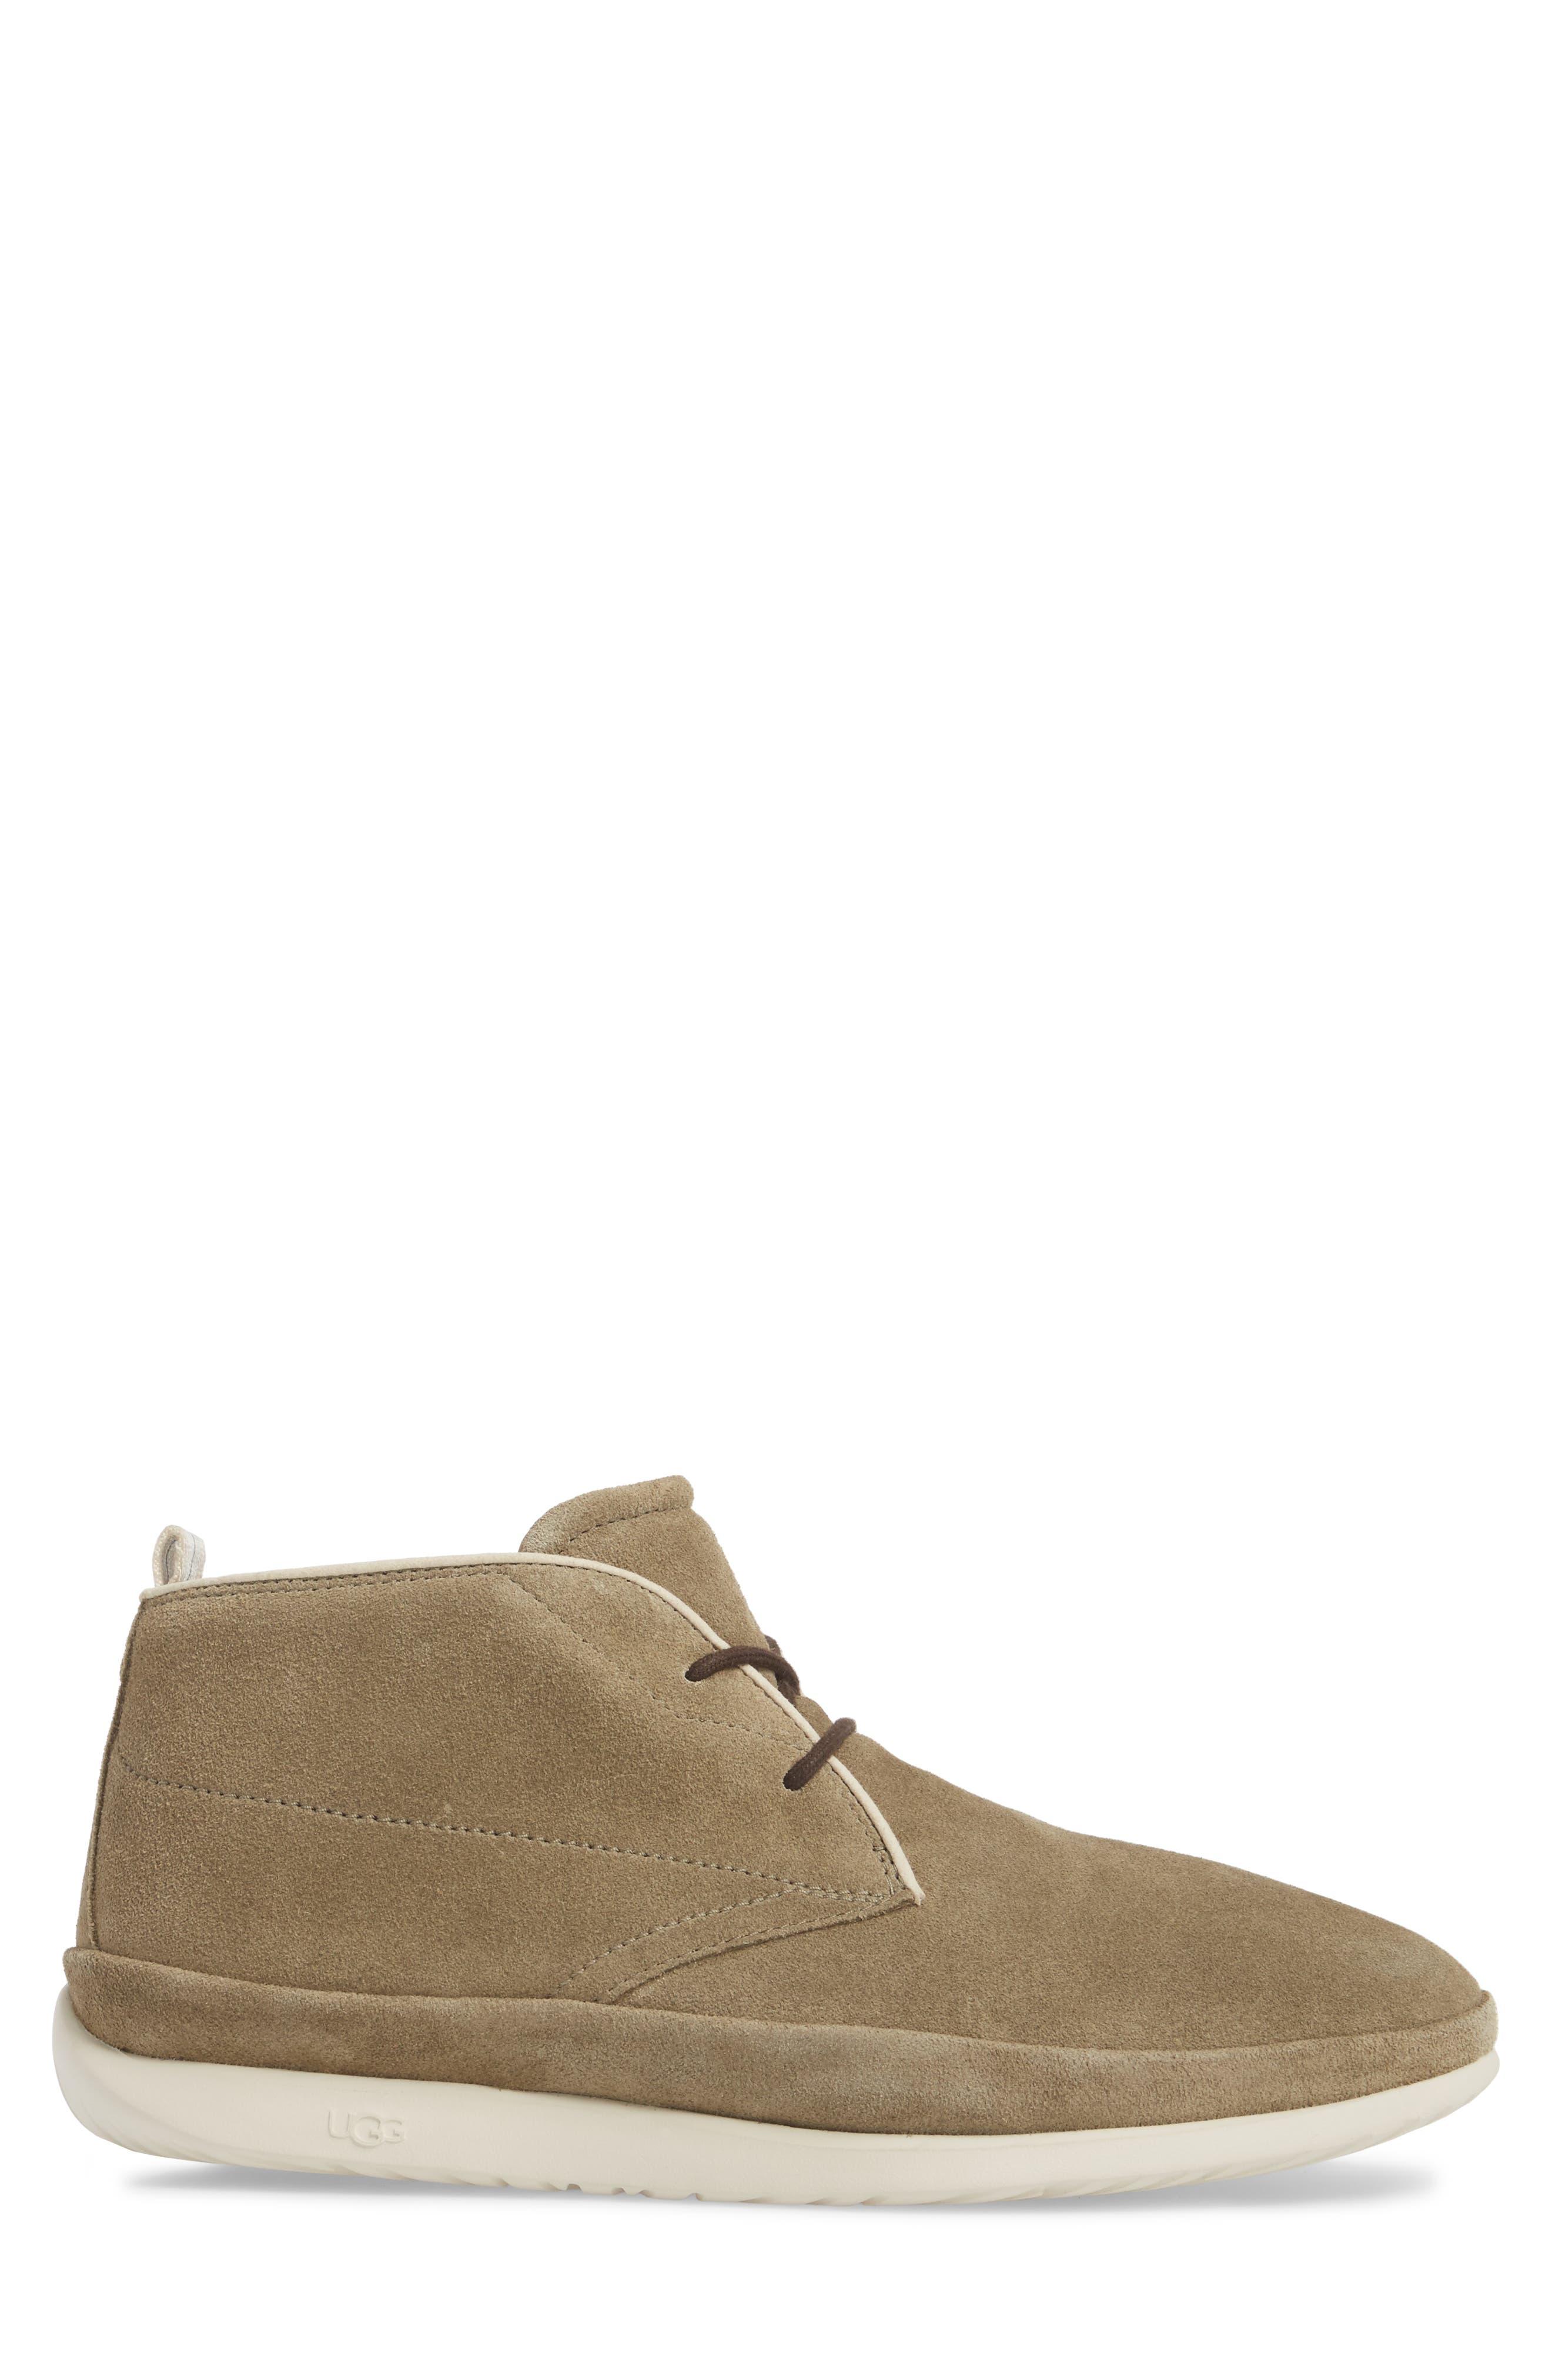 Cali Chukka Boot,                             Alternate thumbnail 3, color,                             Antilope Leather